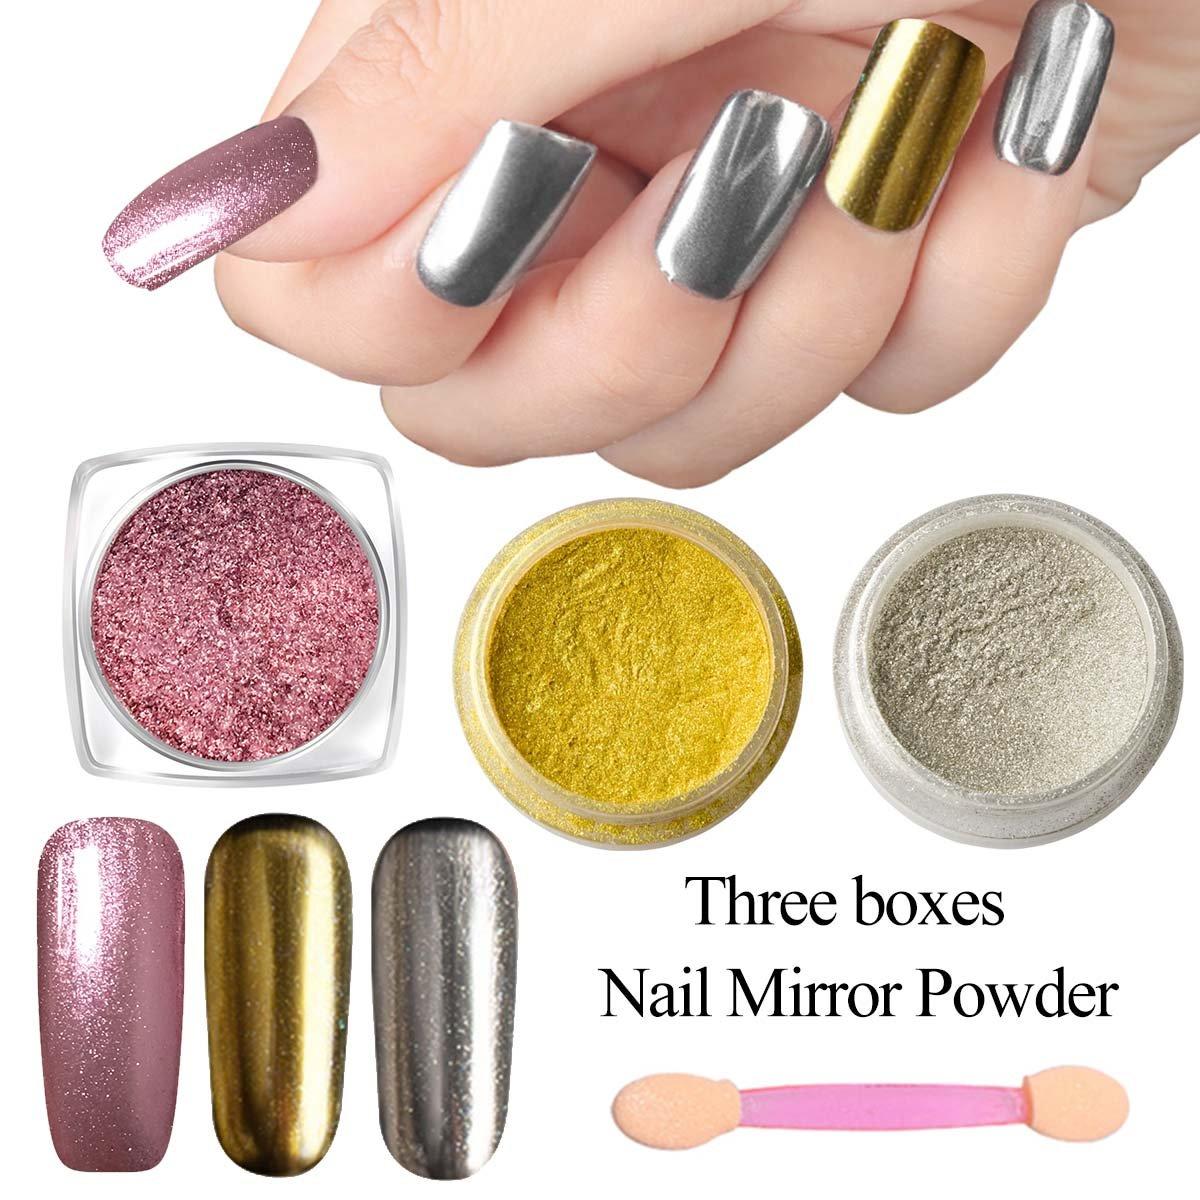 3 Colours Magic Mirror Nail Powder, Saviland Glitter Powder Nail Sequins Chameleon Chrome Nail Powder Pigment Nail Art Decoration Kit (Silver, Gold and Rose Gold)